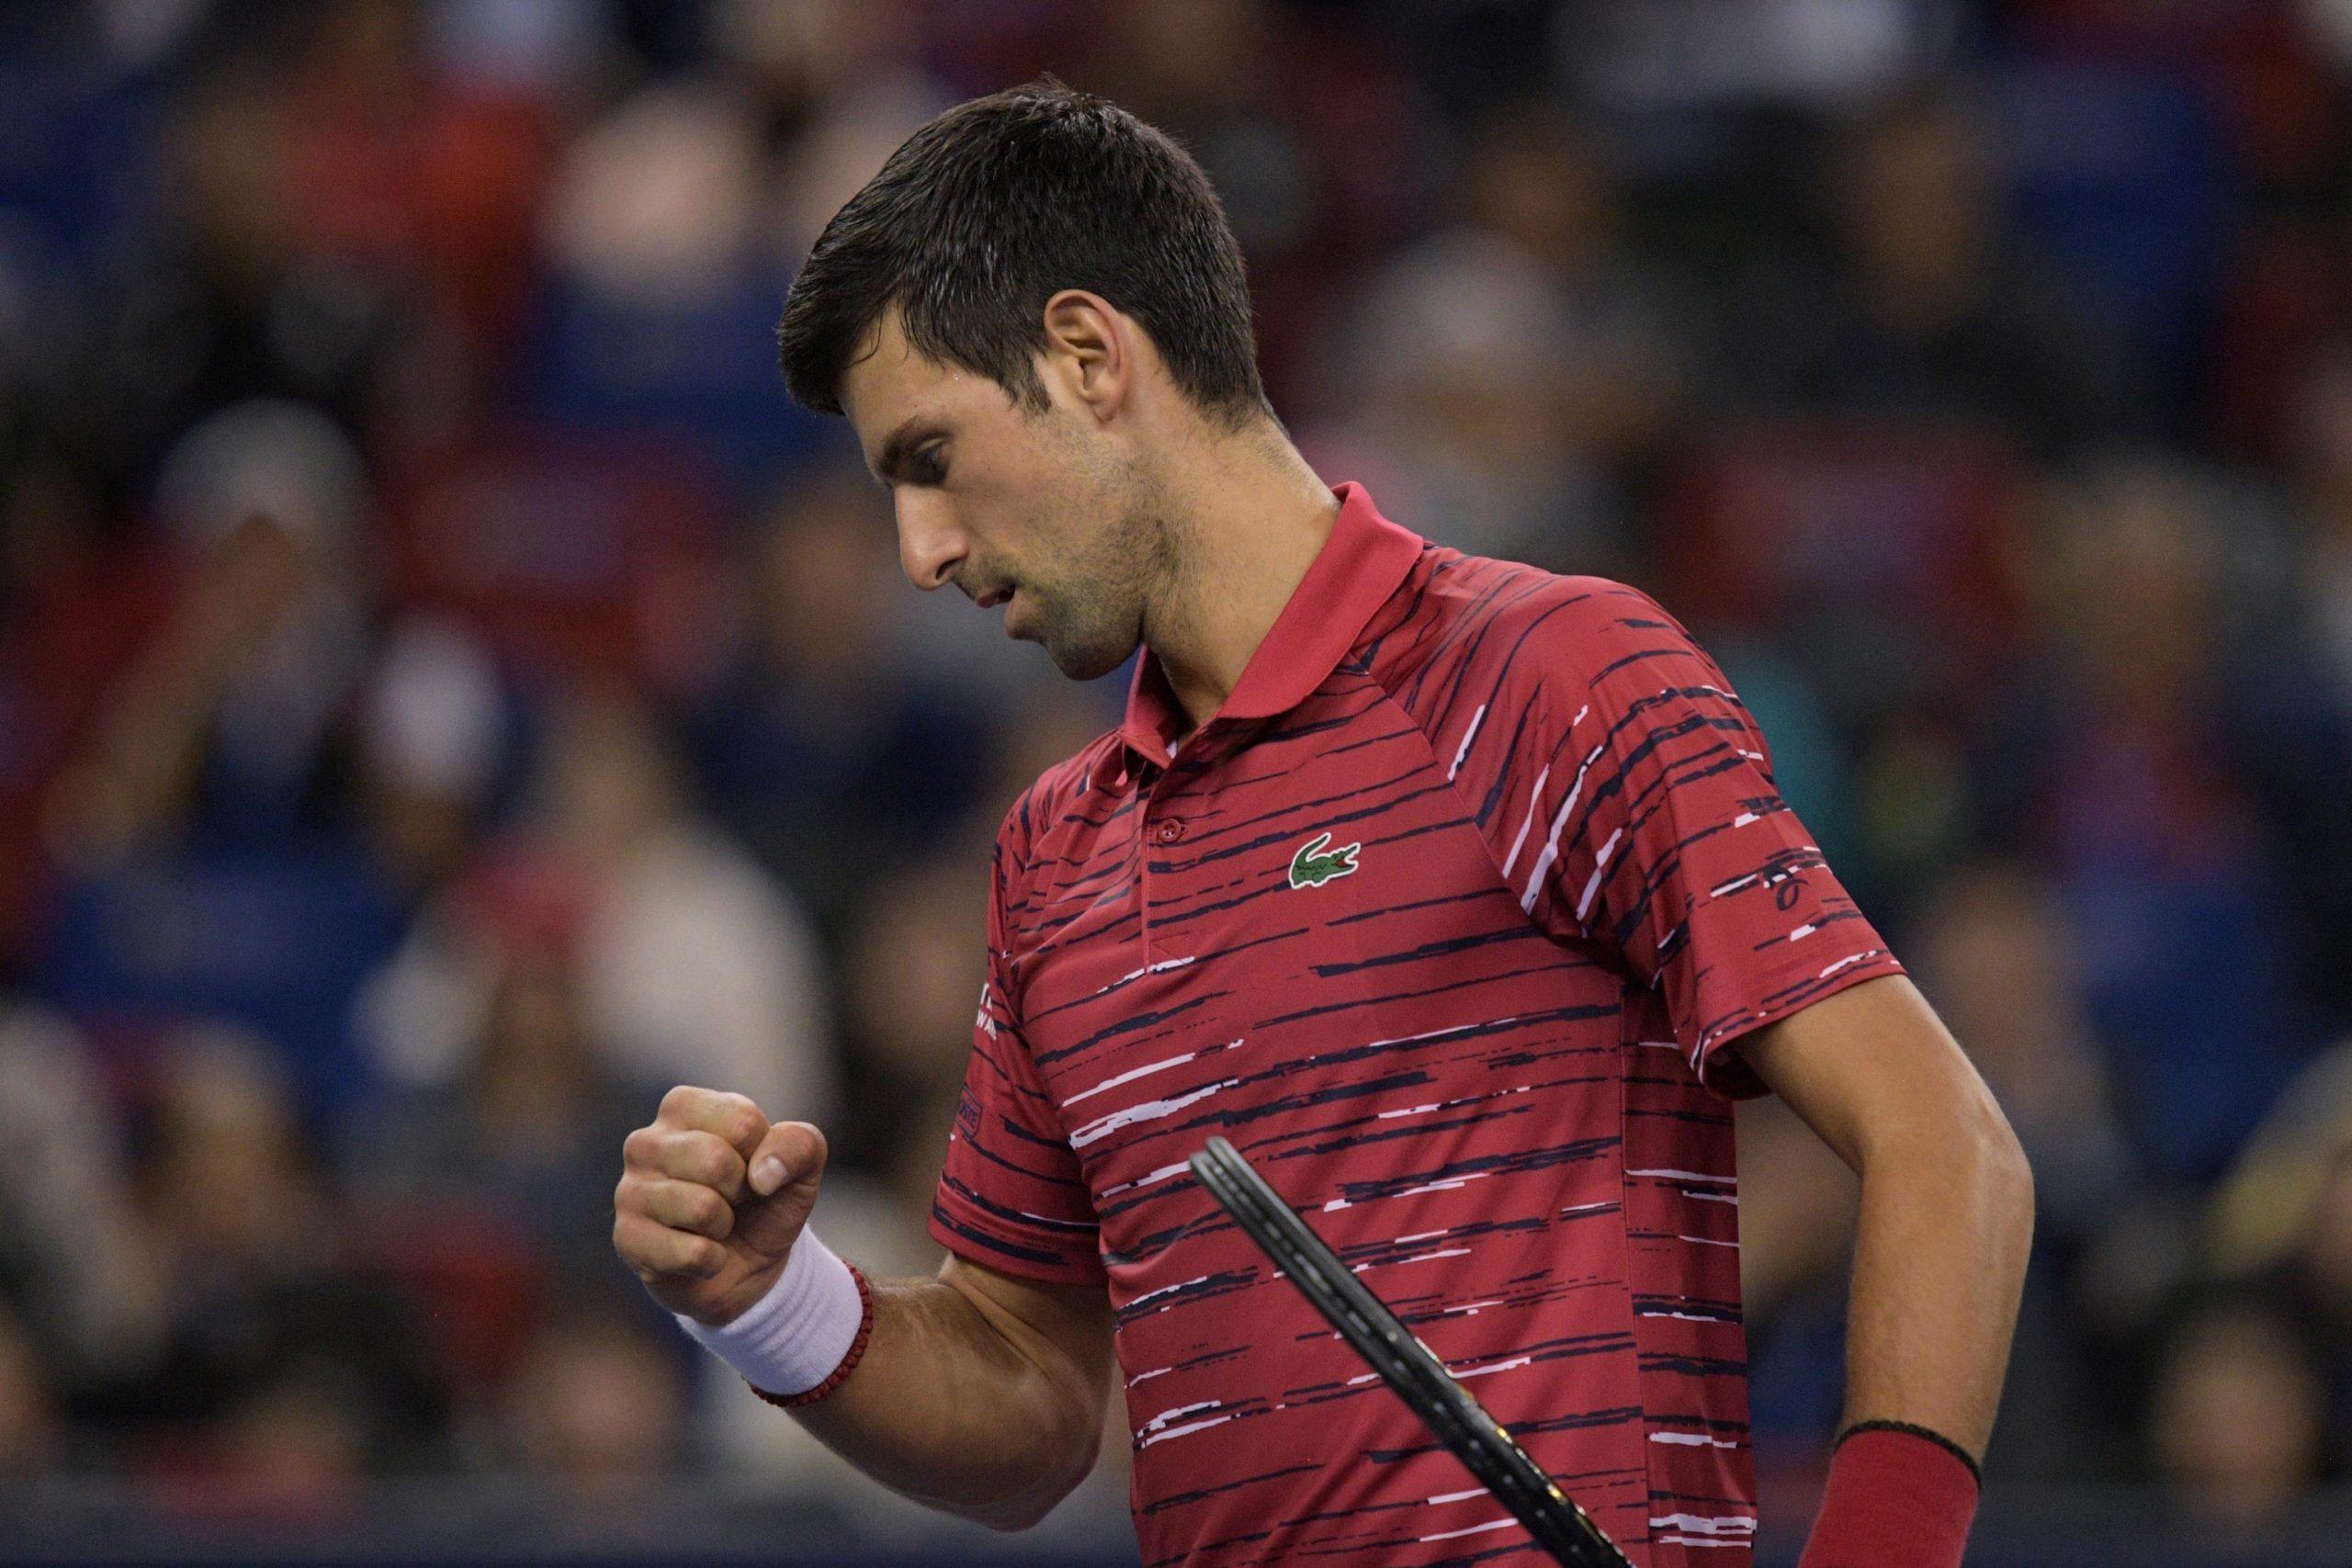 Djokovic bate Shapovalov na estreia em Xangai